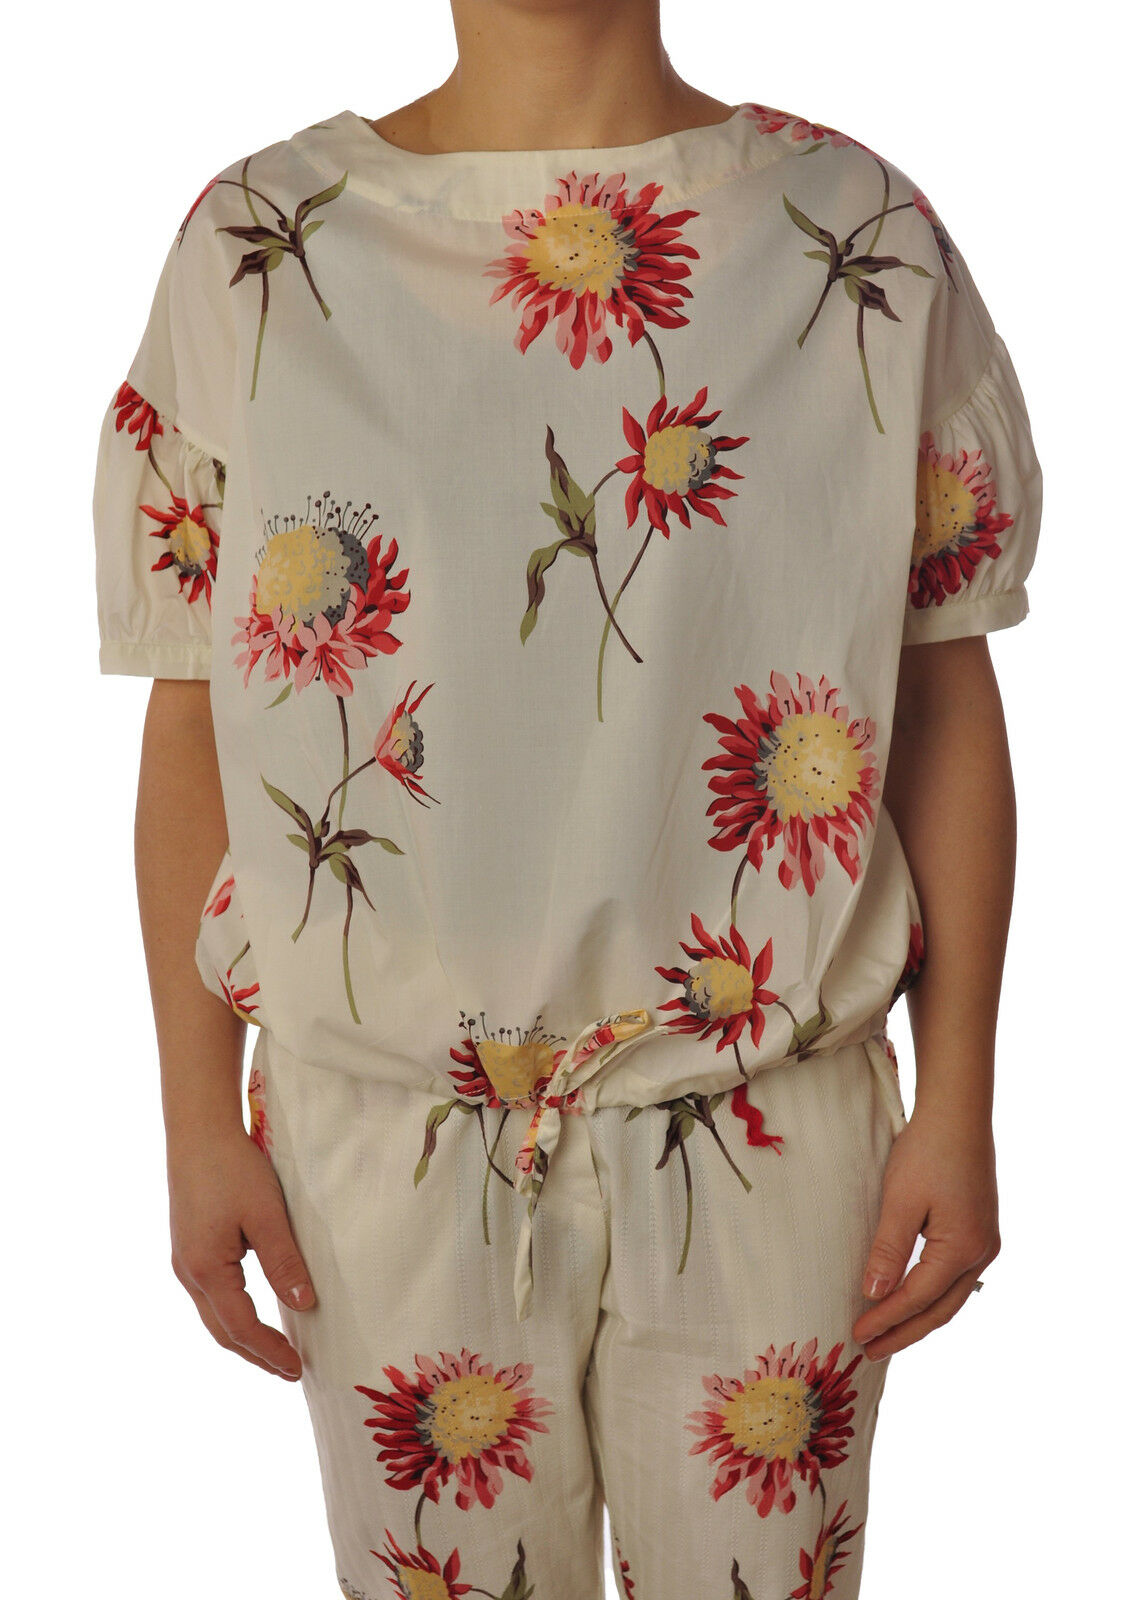 Ottod'ame - Shirts-Blouses - Woman - Fantasy - 3389208G184128